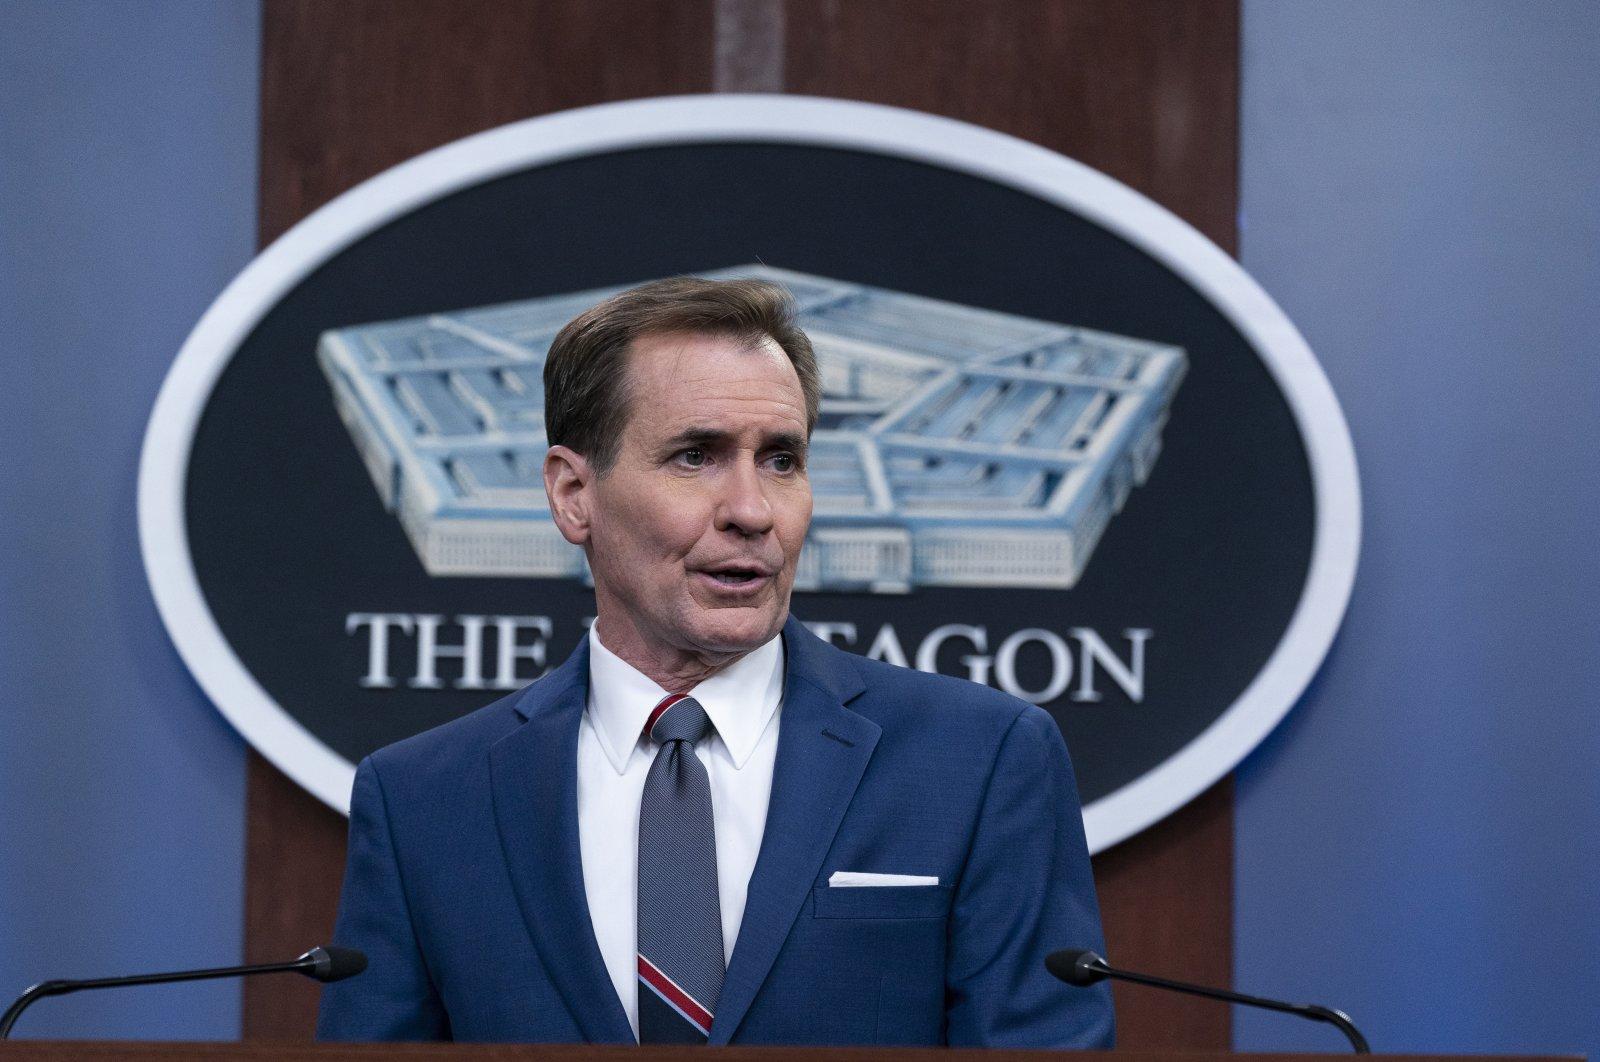 Pentagon Spokesperson John Kirby speaks during a media briefing at the Pentagon in Washington, United States, June 4, 2021. (AP Photo)